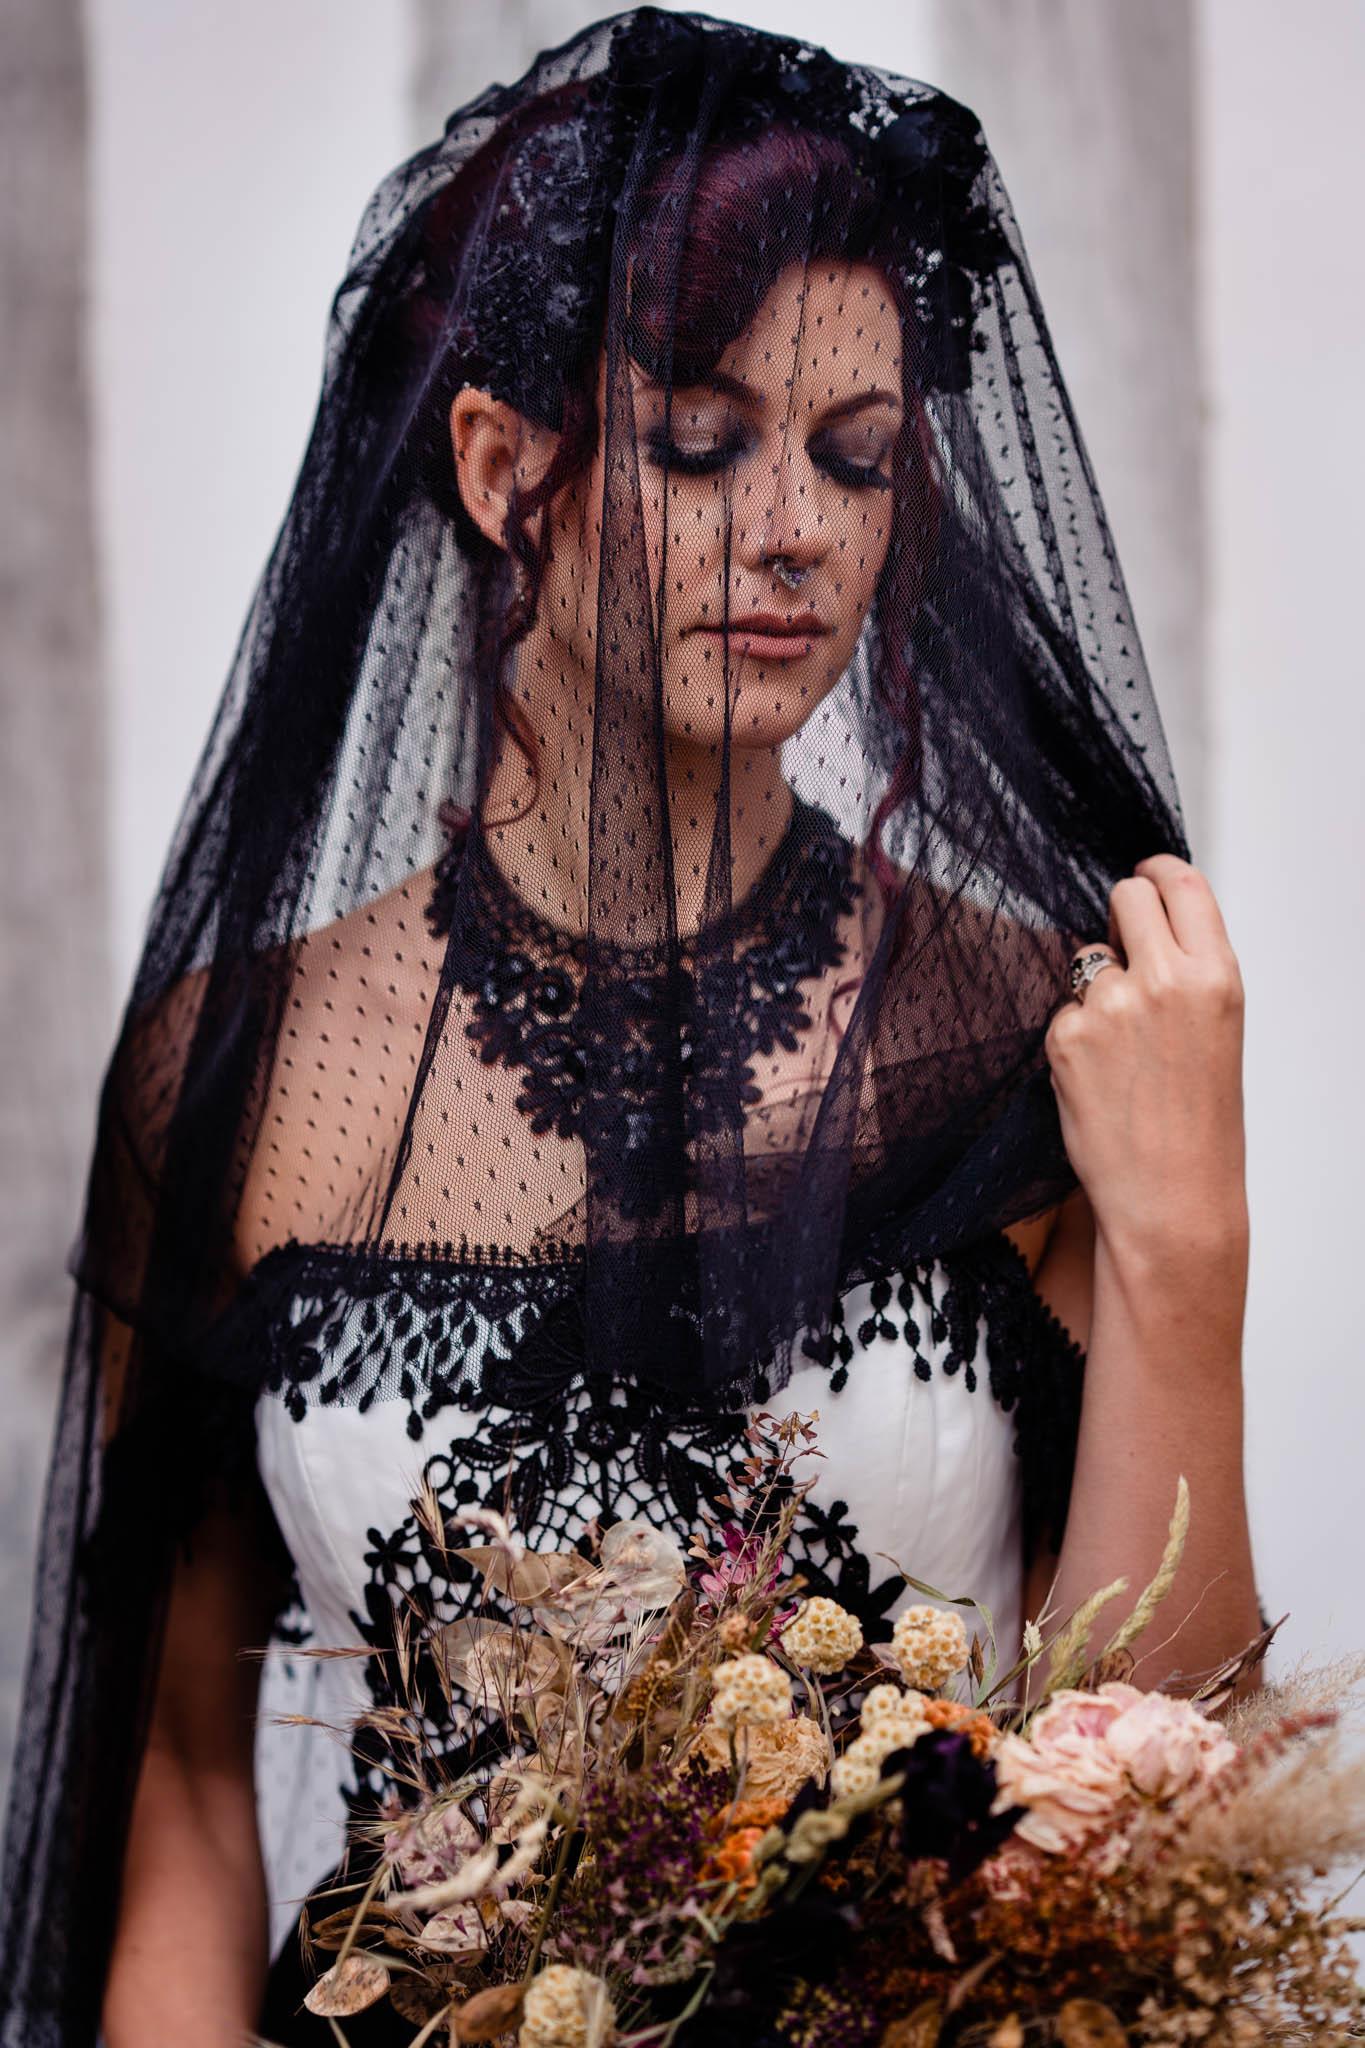 black bridal veil - black veil - black wedding dress - alternative wedding dress - elegant gothic wedding